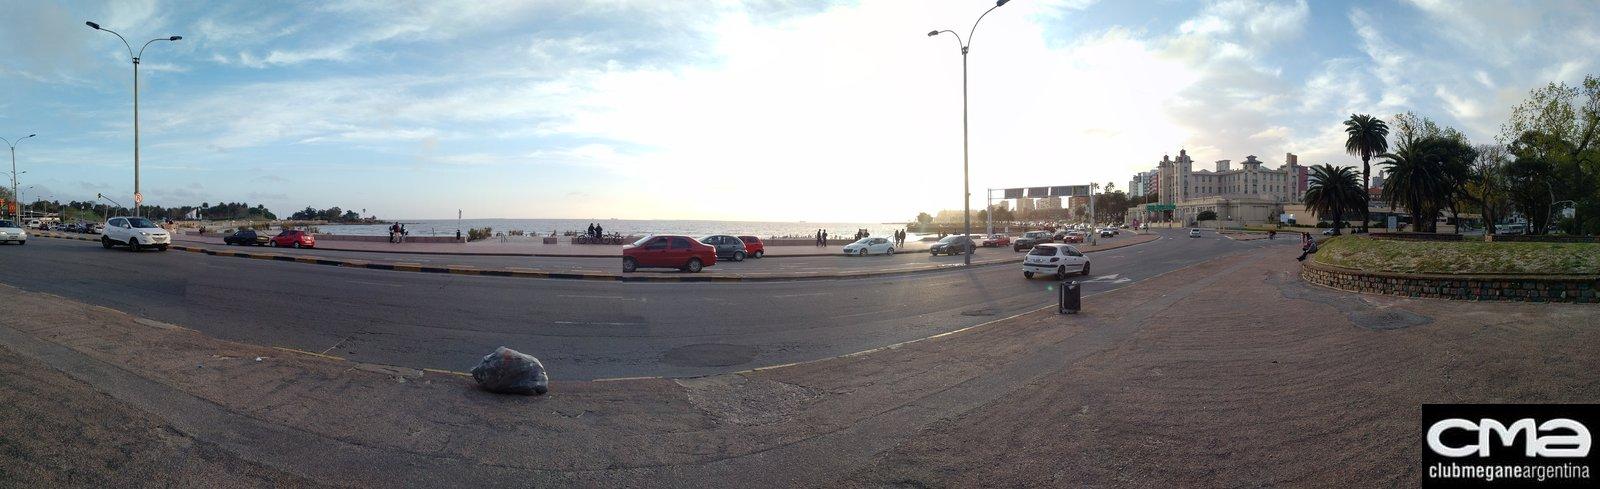 IMG_20160924_1813226-panorama.jpg